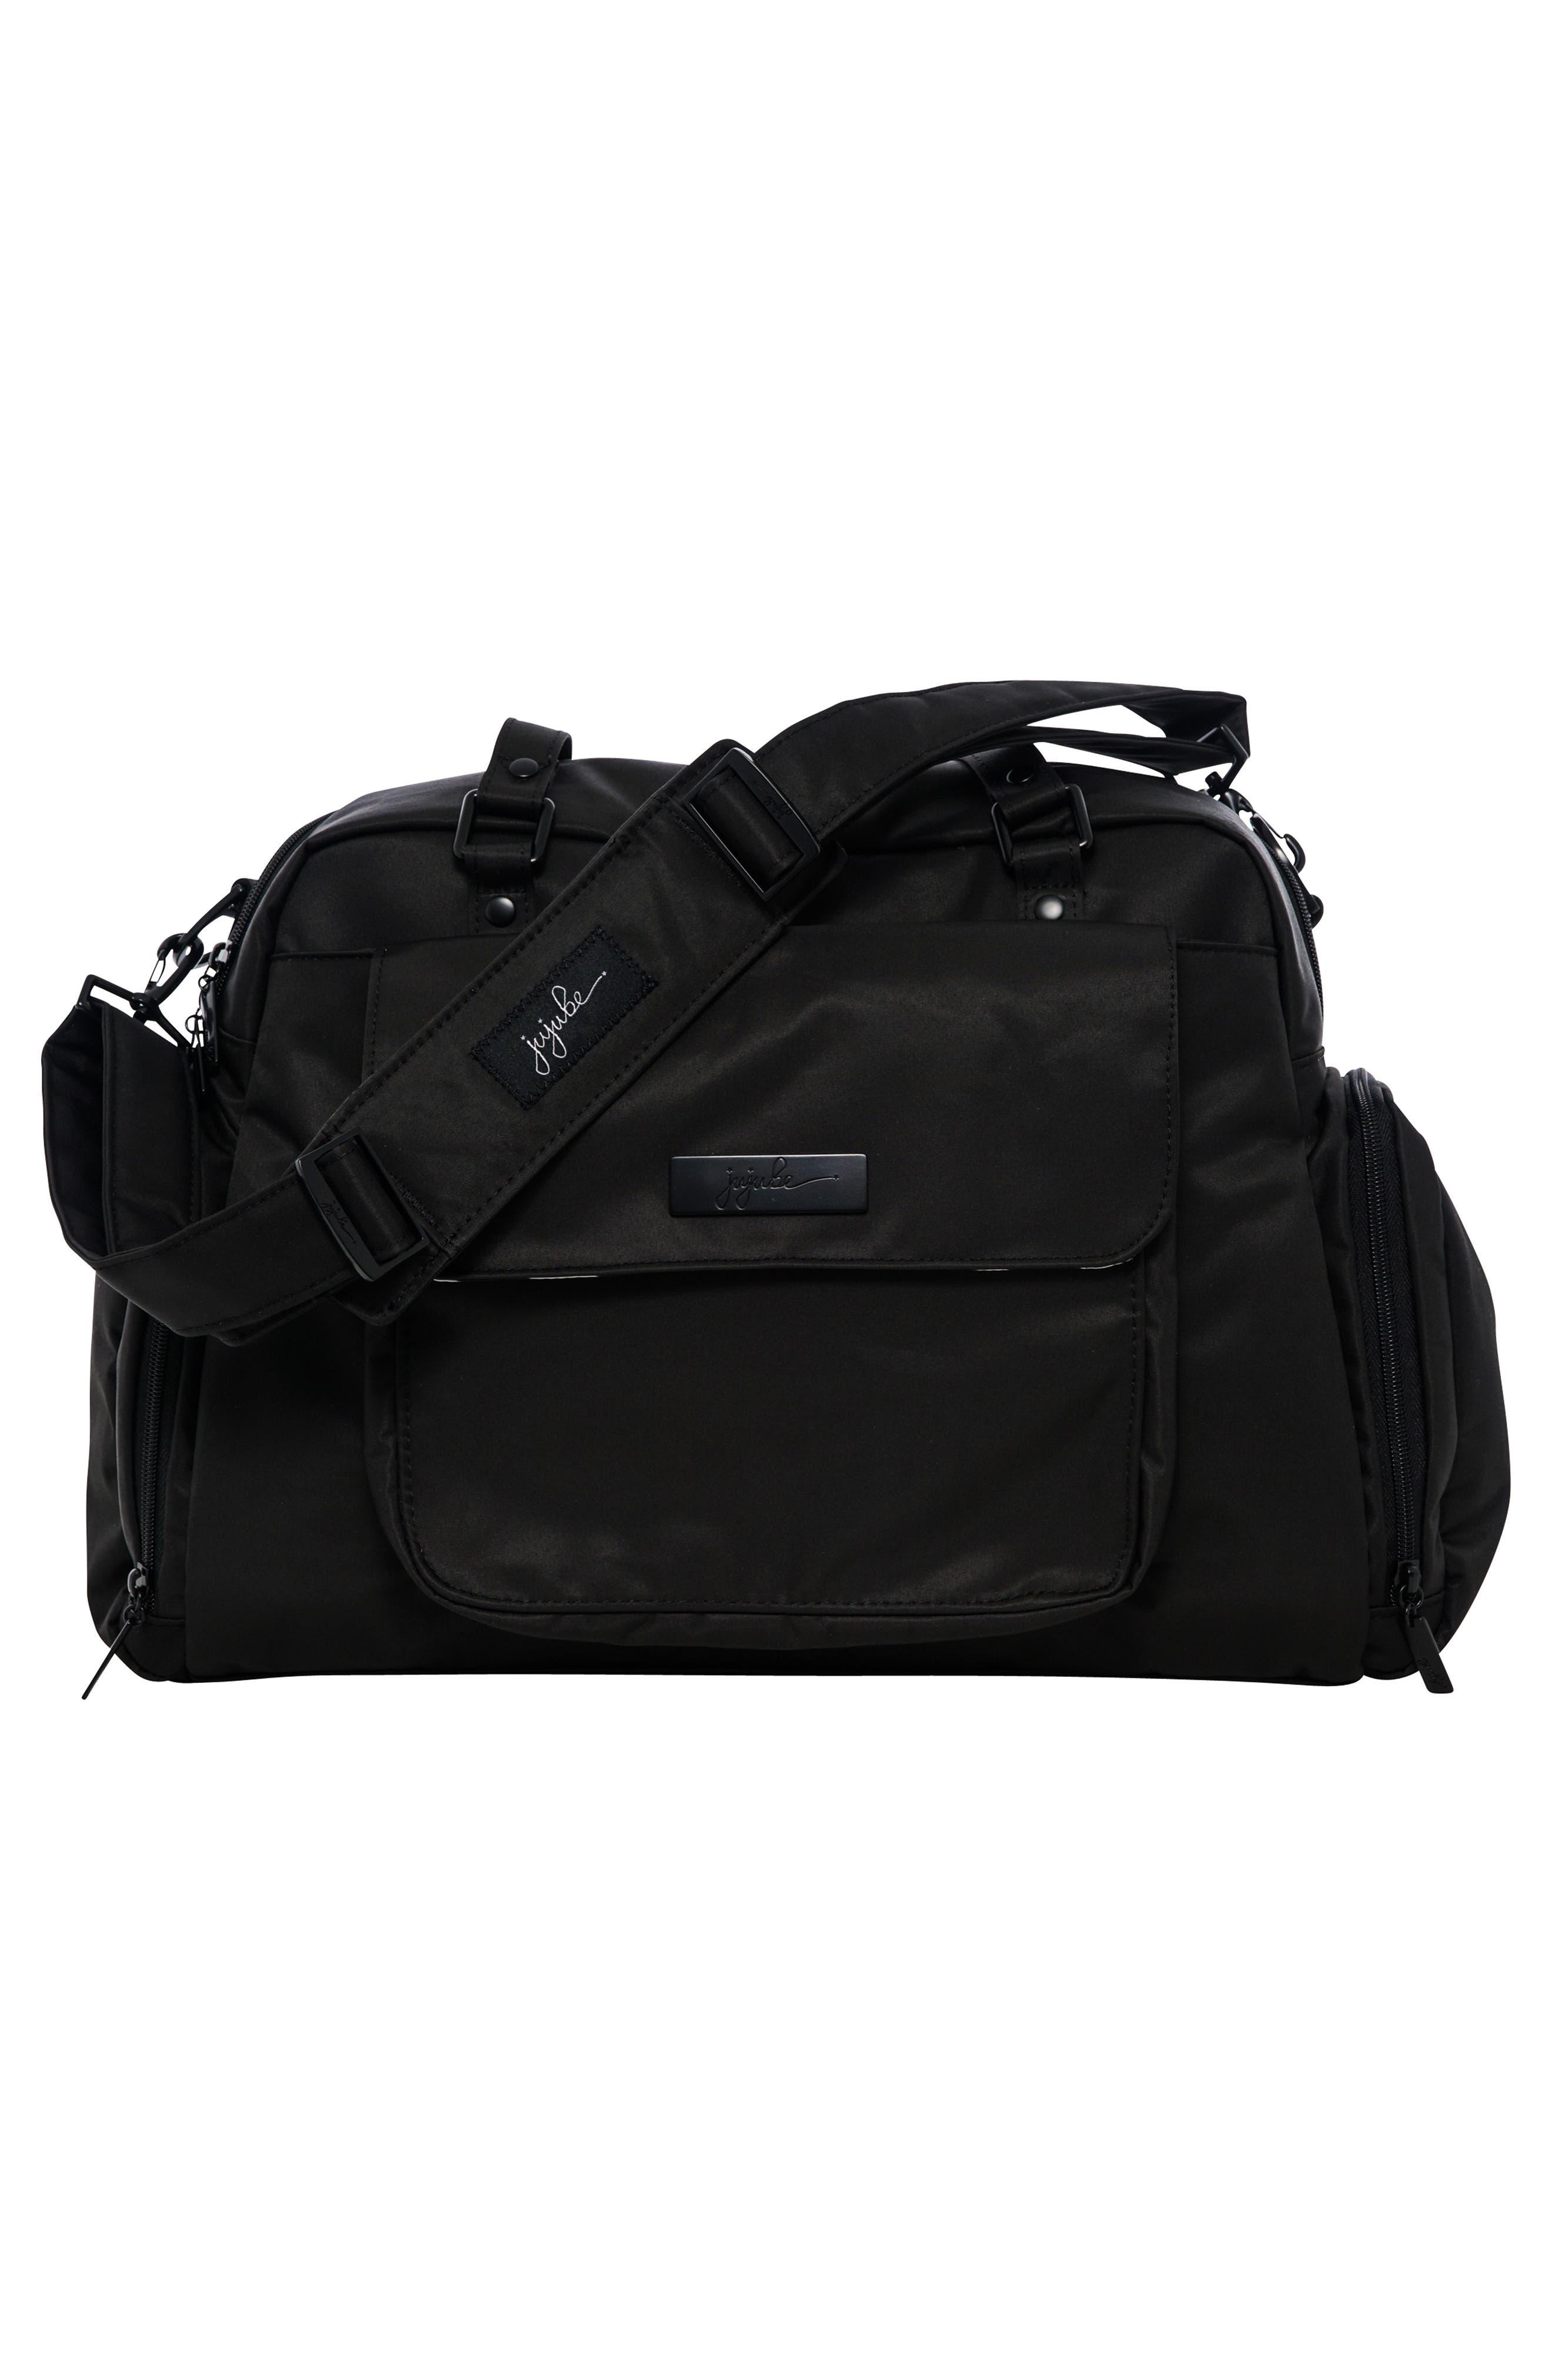 Onyx Be Pumped Bag,                             Alternate thumbnail 5, color,                             Black Out